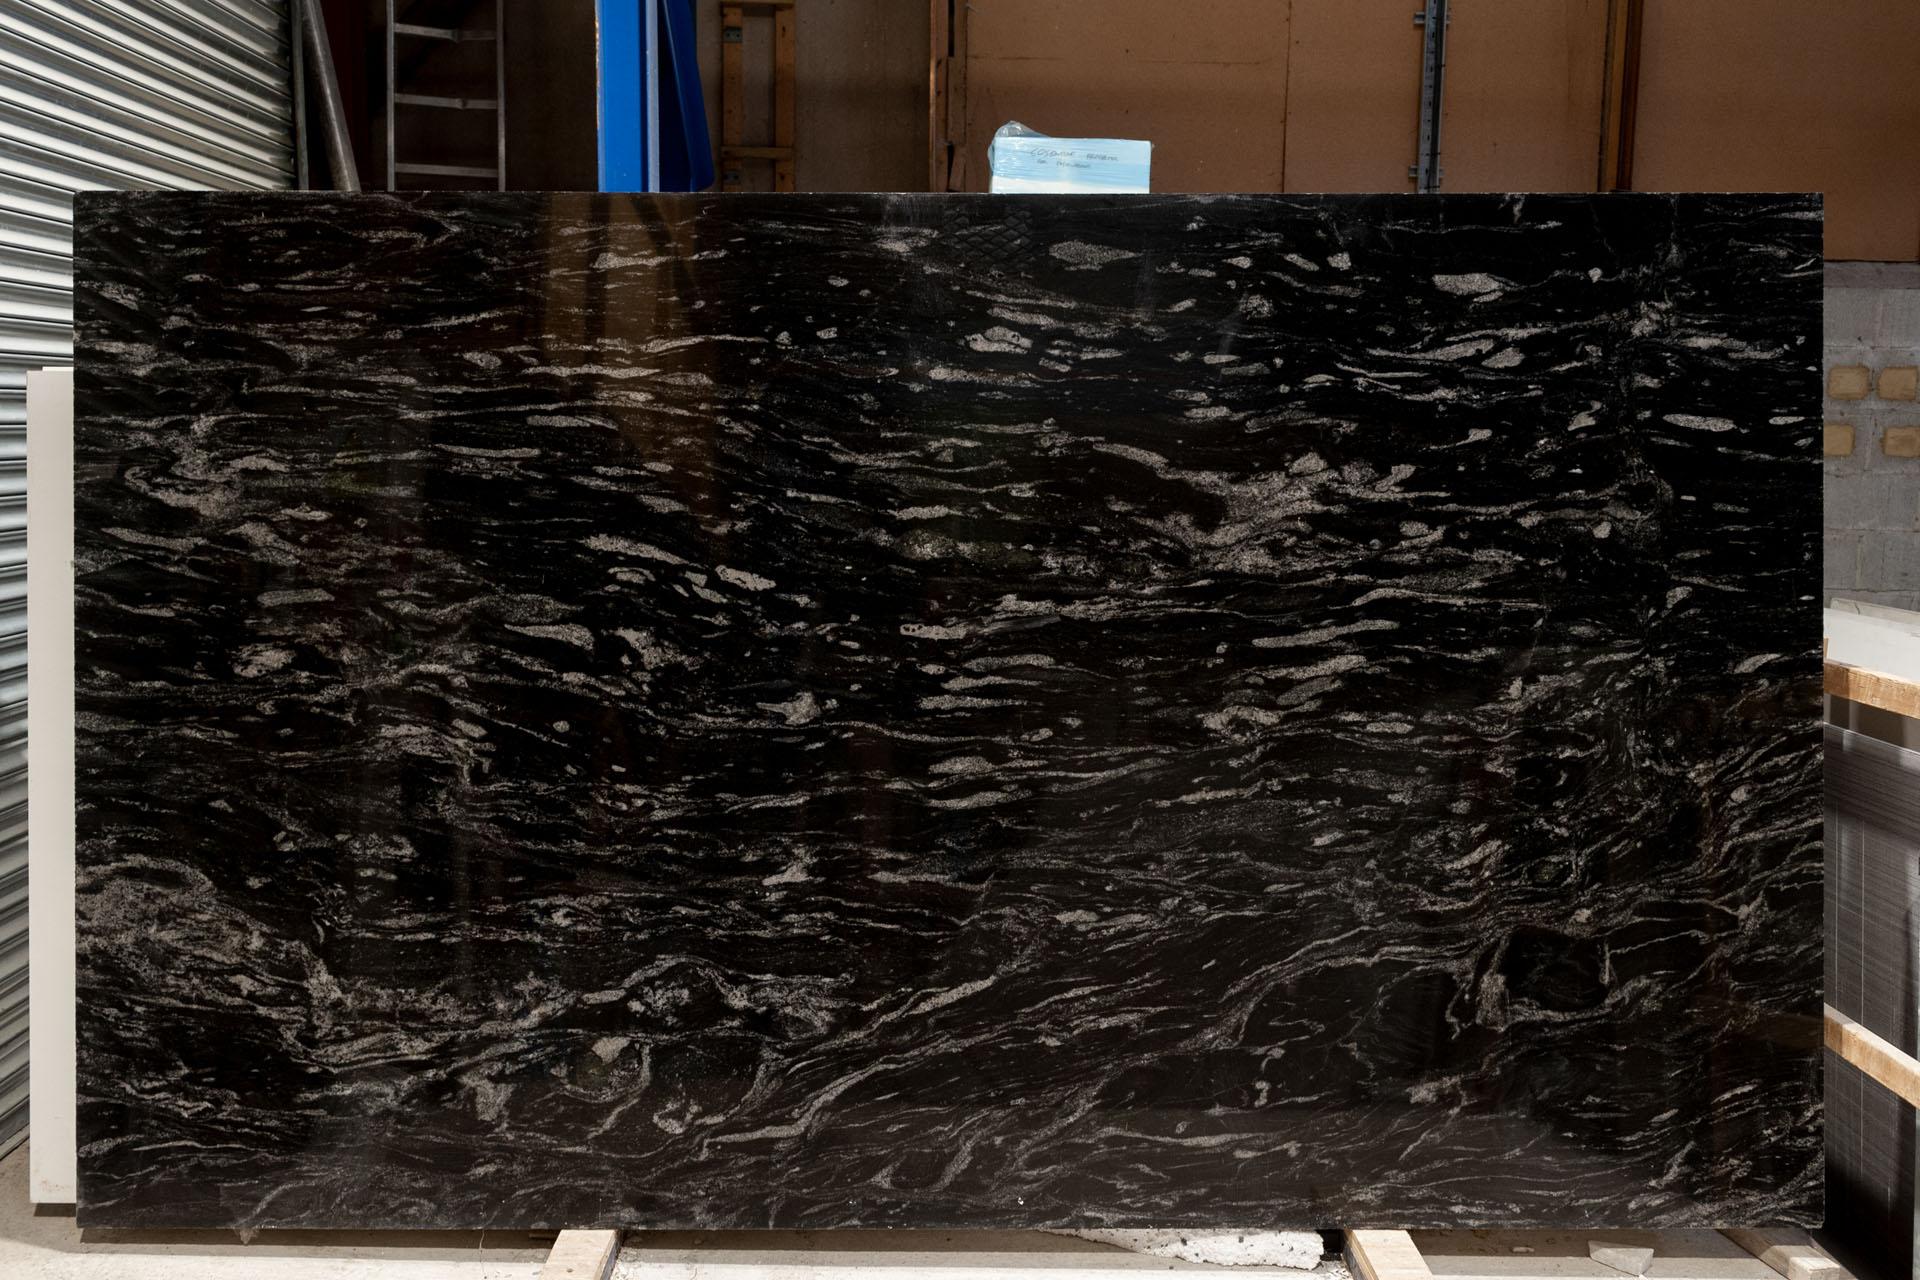 Pretoria Granite MG181119 34457 110108 a